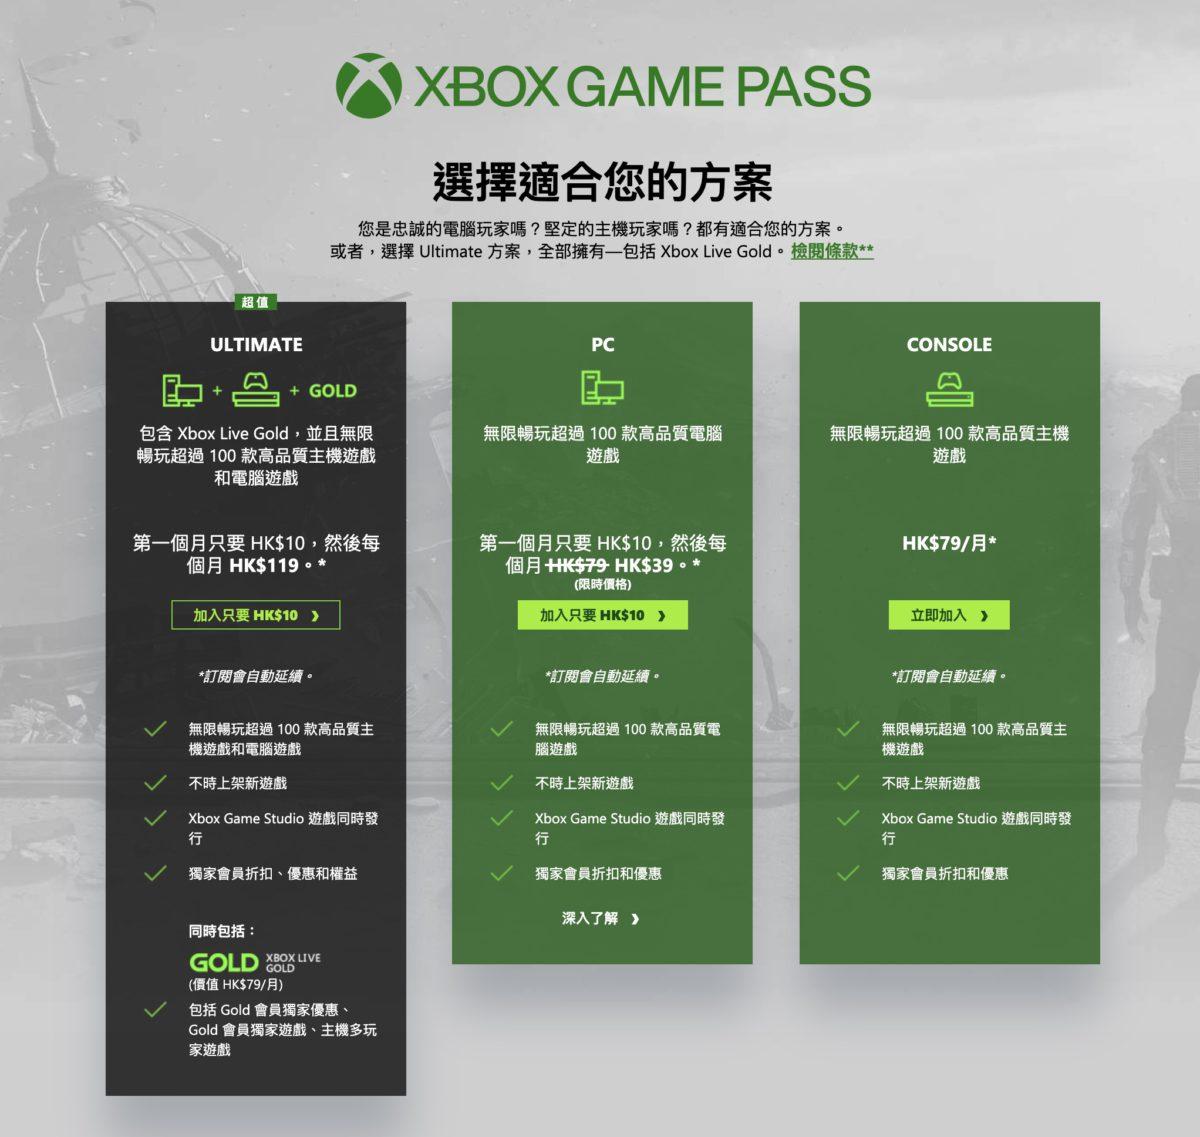 Xbox Game Pass Ultimate 方案提供連線同玩、遊戲折扣等服務和優惠,現在更加上雲端遊戲串流。